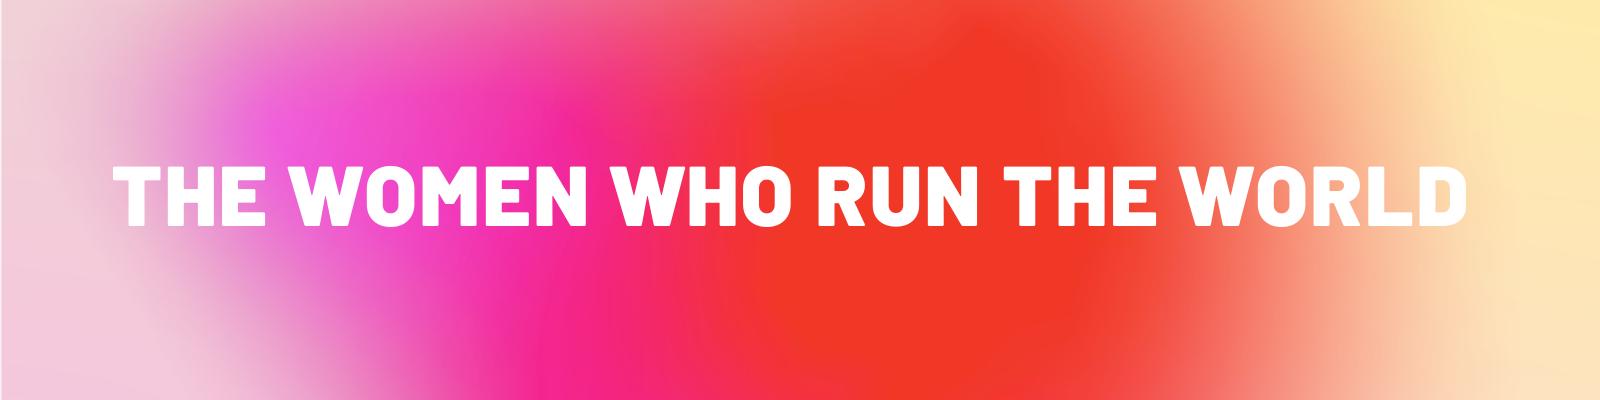 The Women Who Run the World